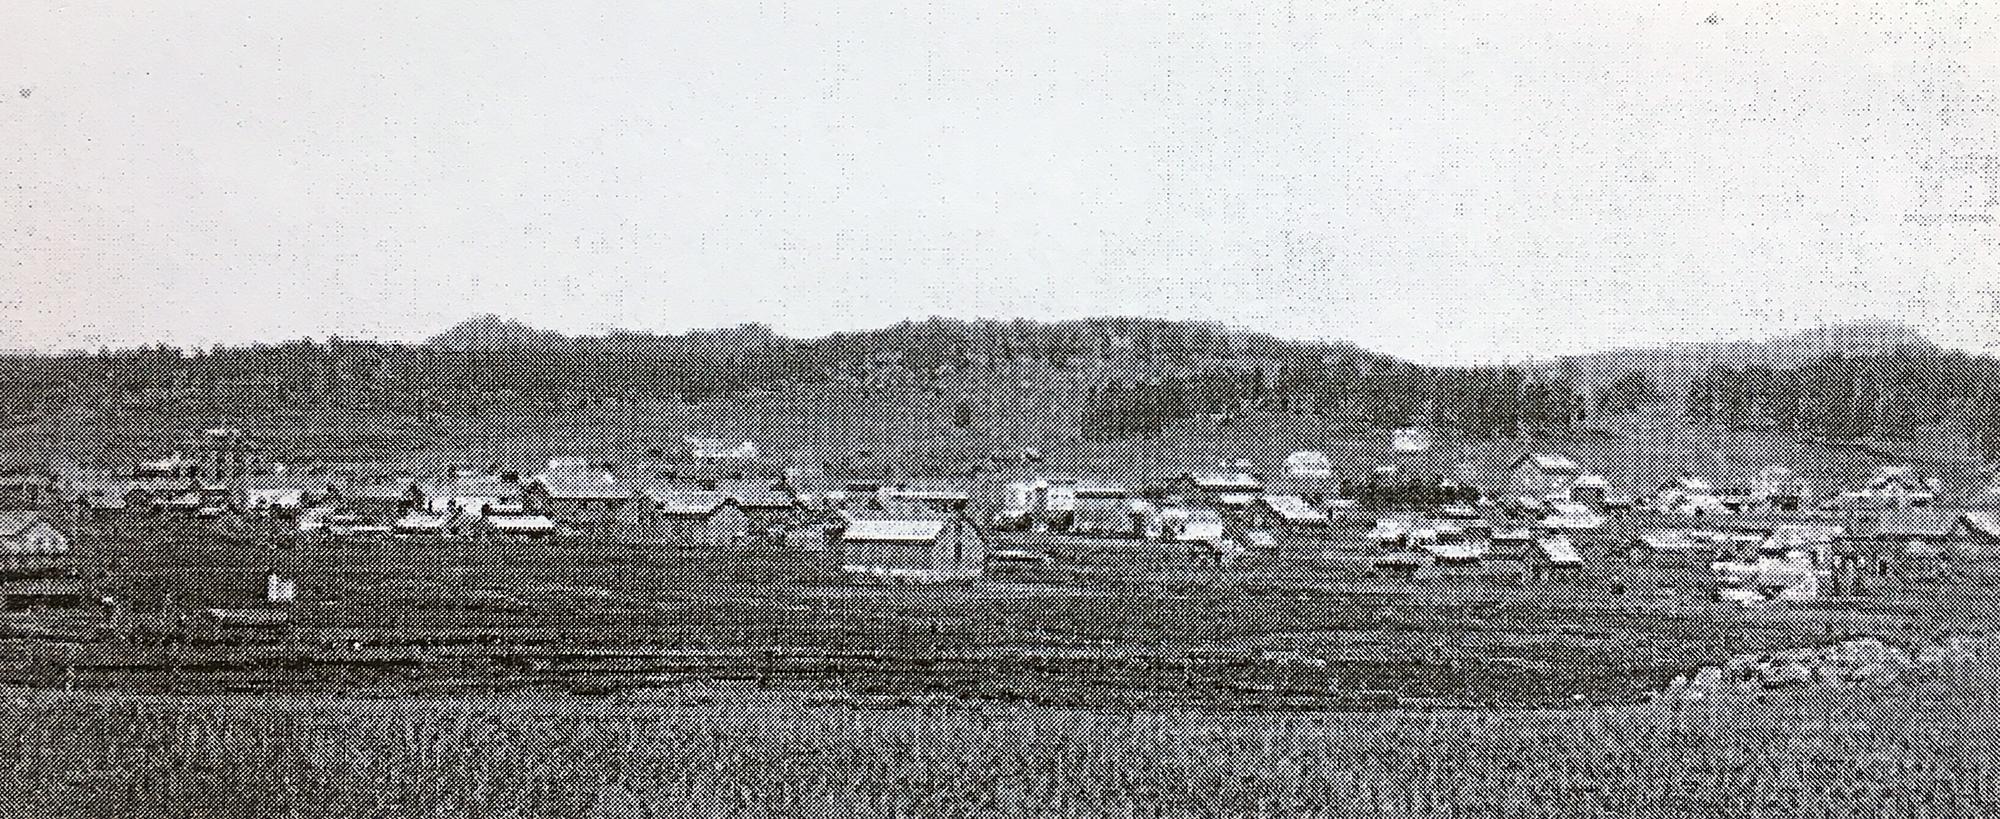 custer sd, 1870s